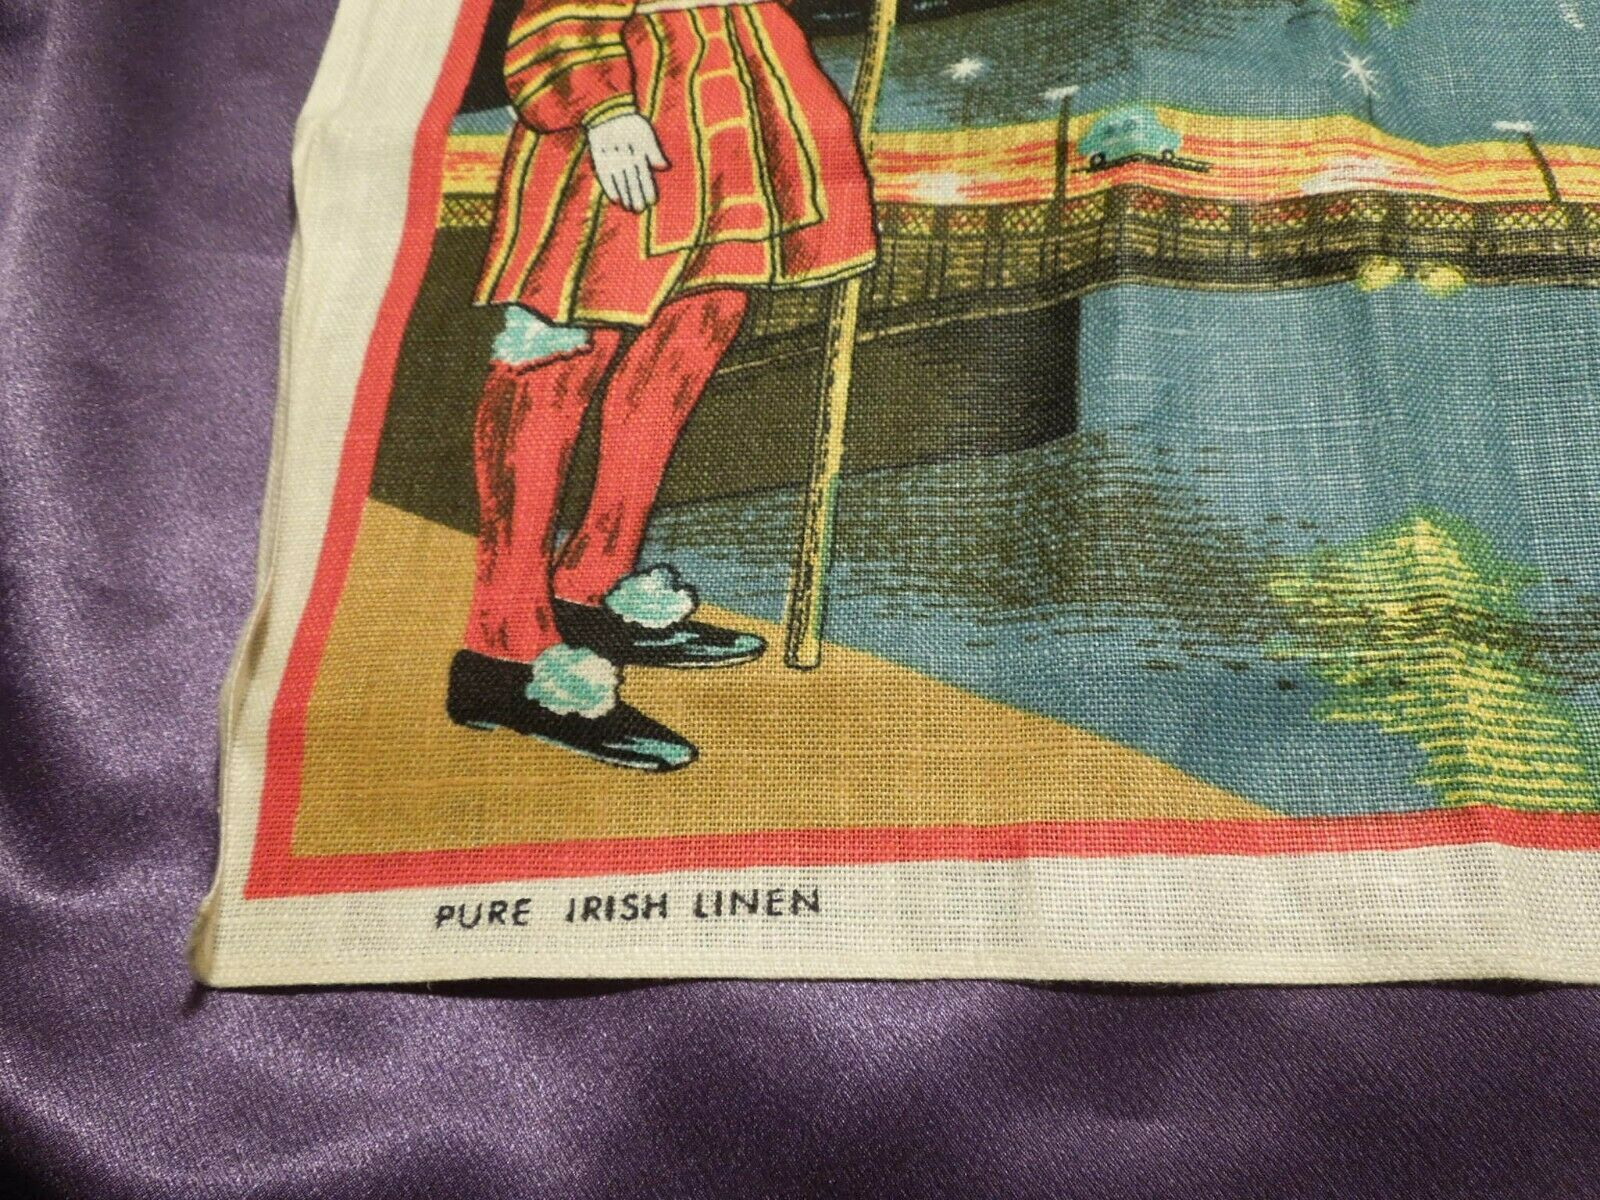 Vintage London by Night by Blackstaff Pure Irish Linen Towel Art image 6